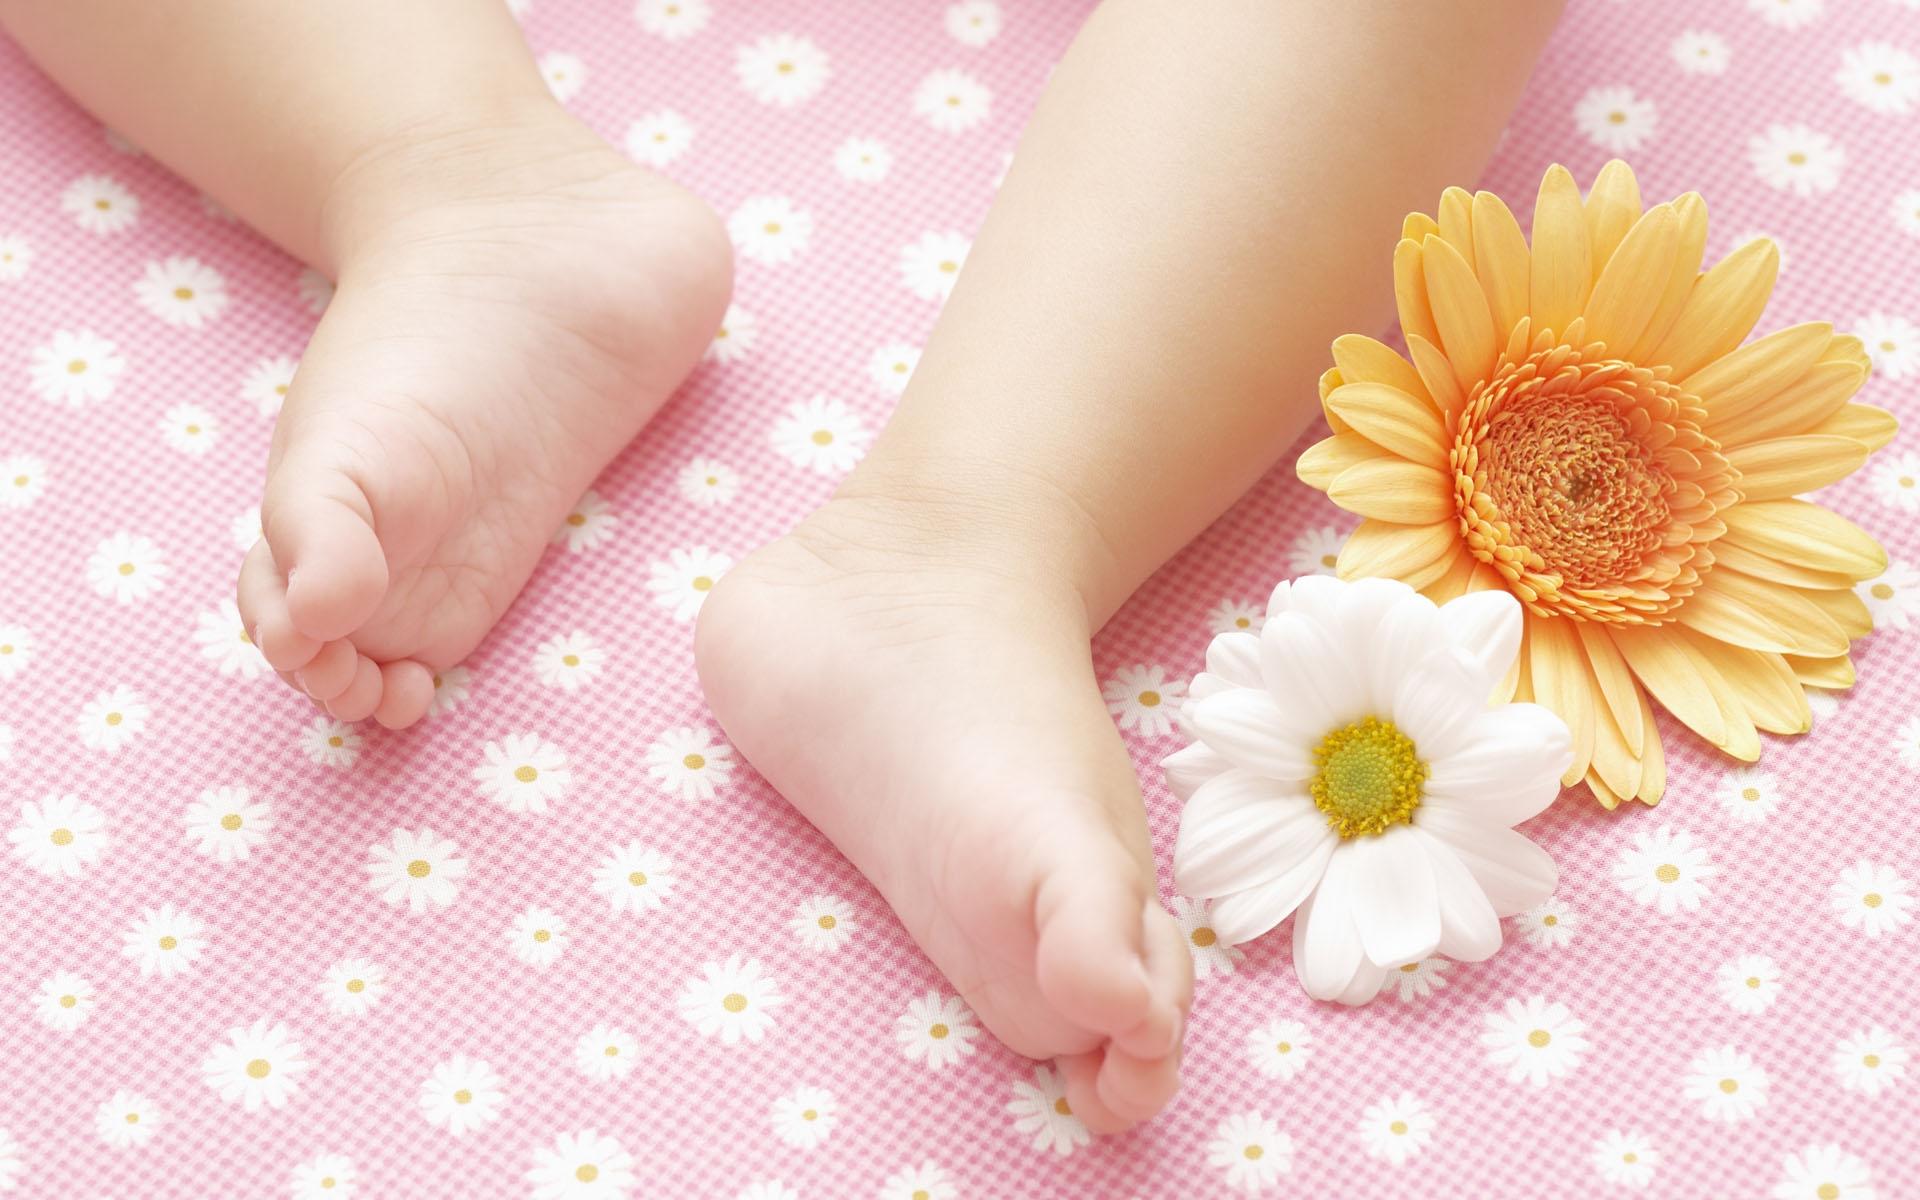 Wallpaper Child Feet Flowers Baby 1920x1200